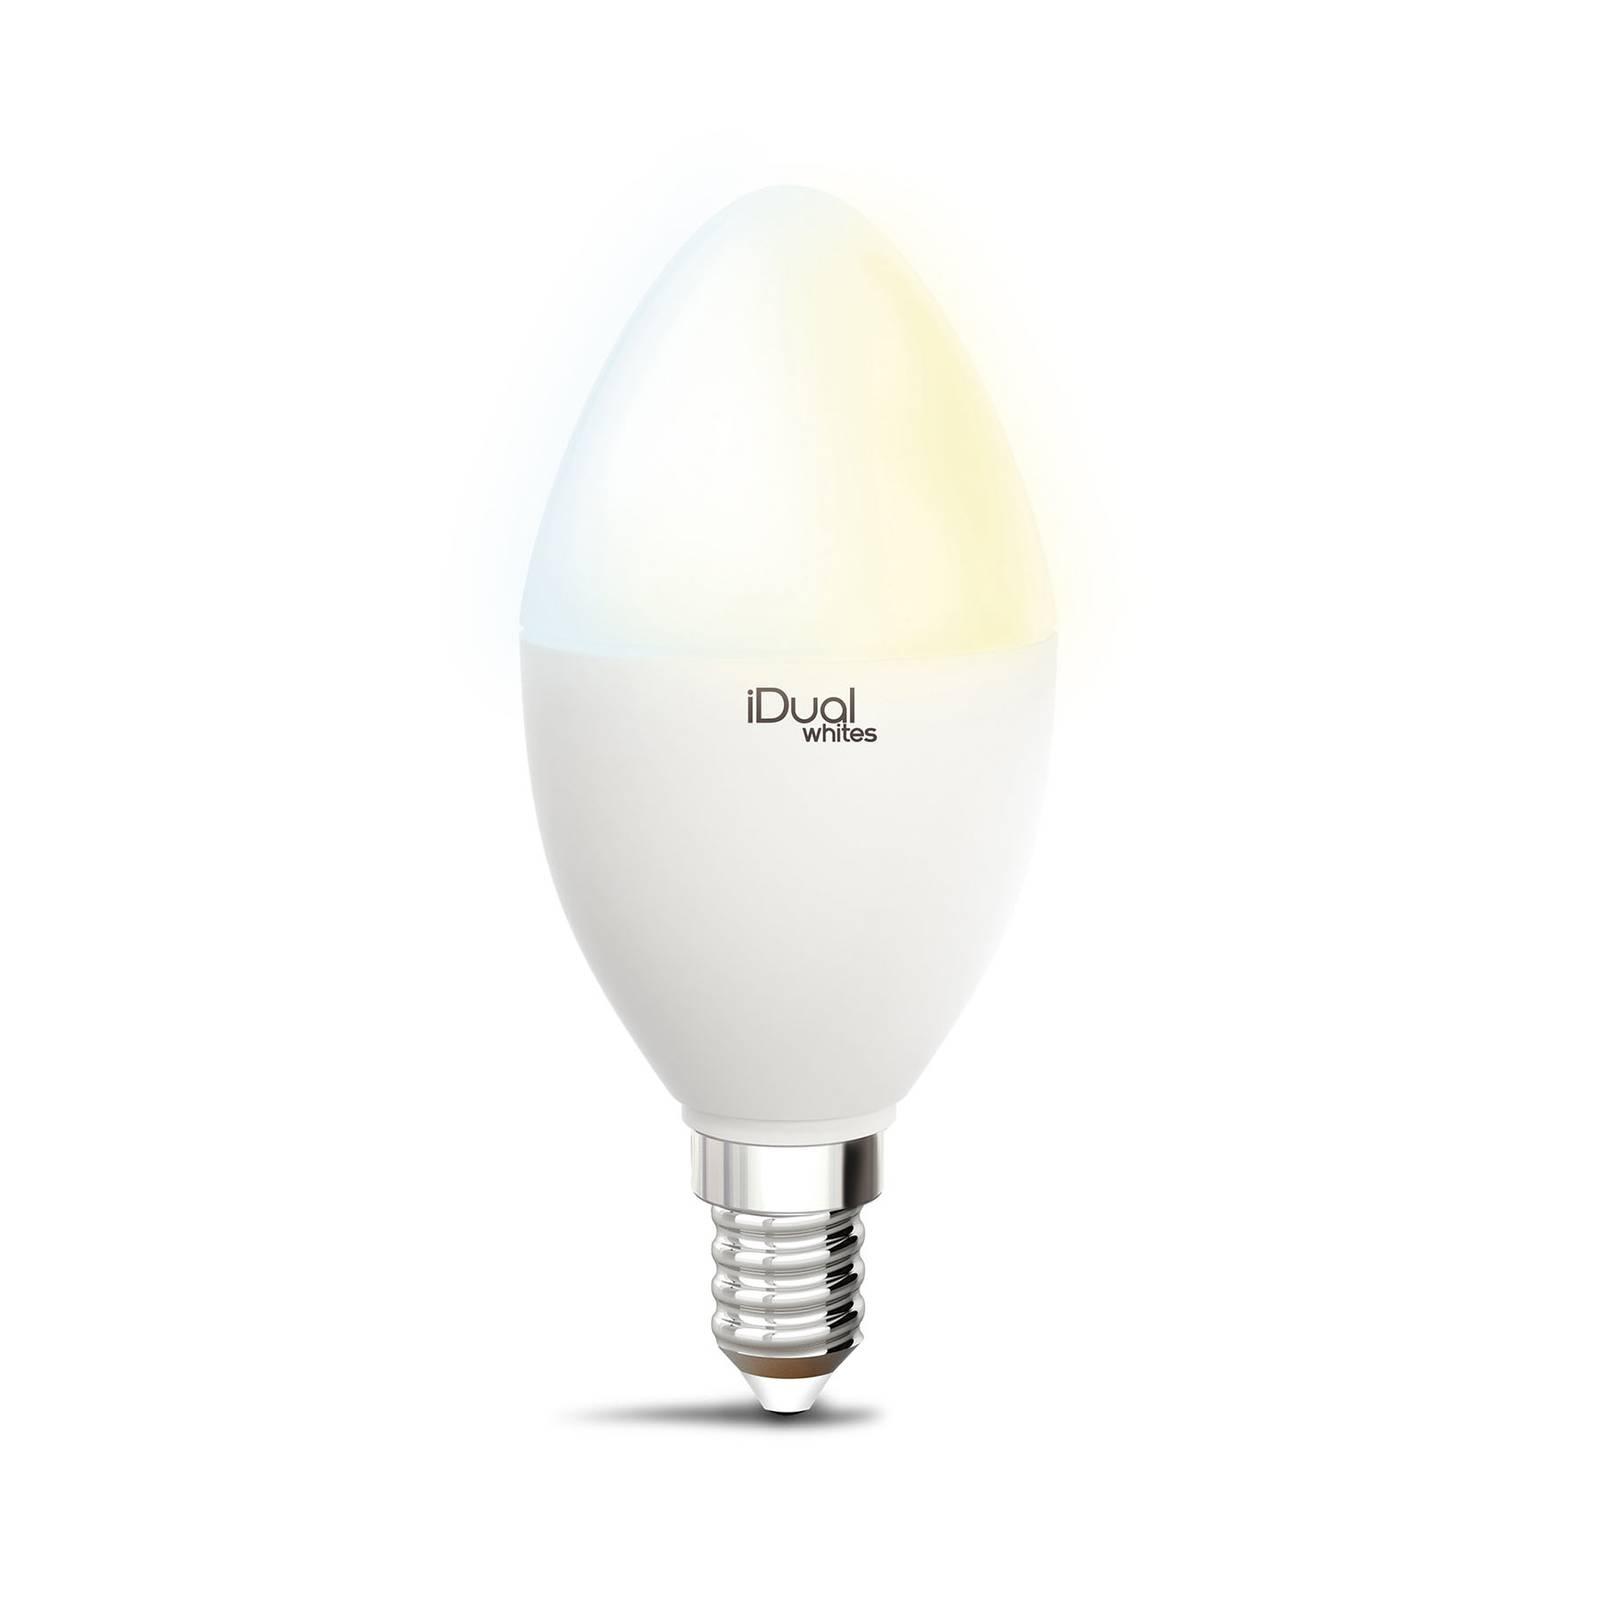 iDual Whites -LED-lamppu, kynttilä P45 E14 5,5 W